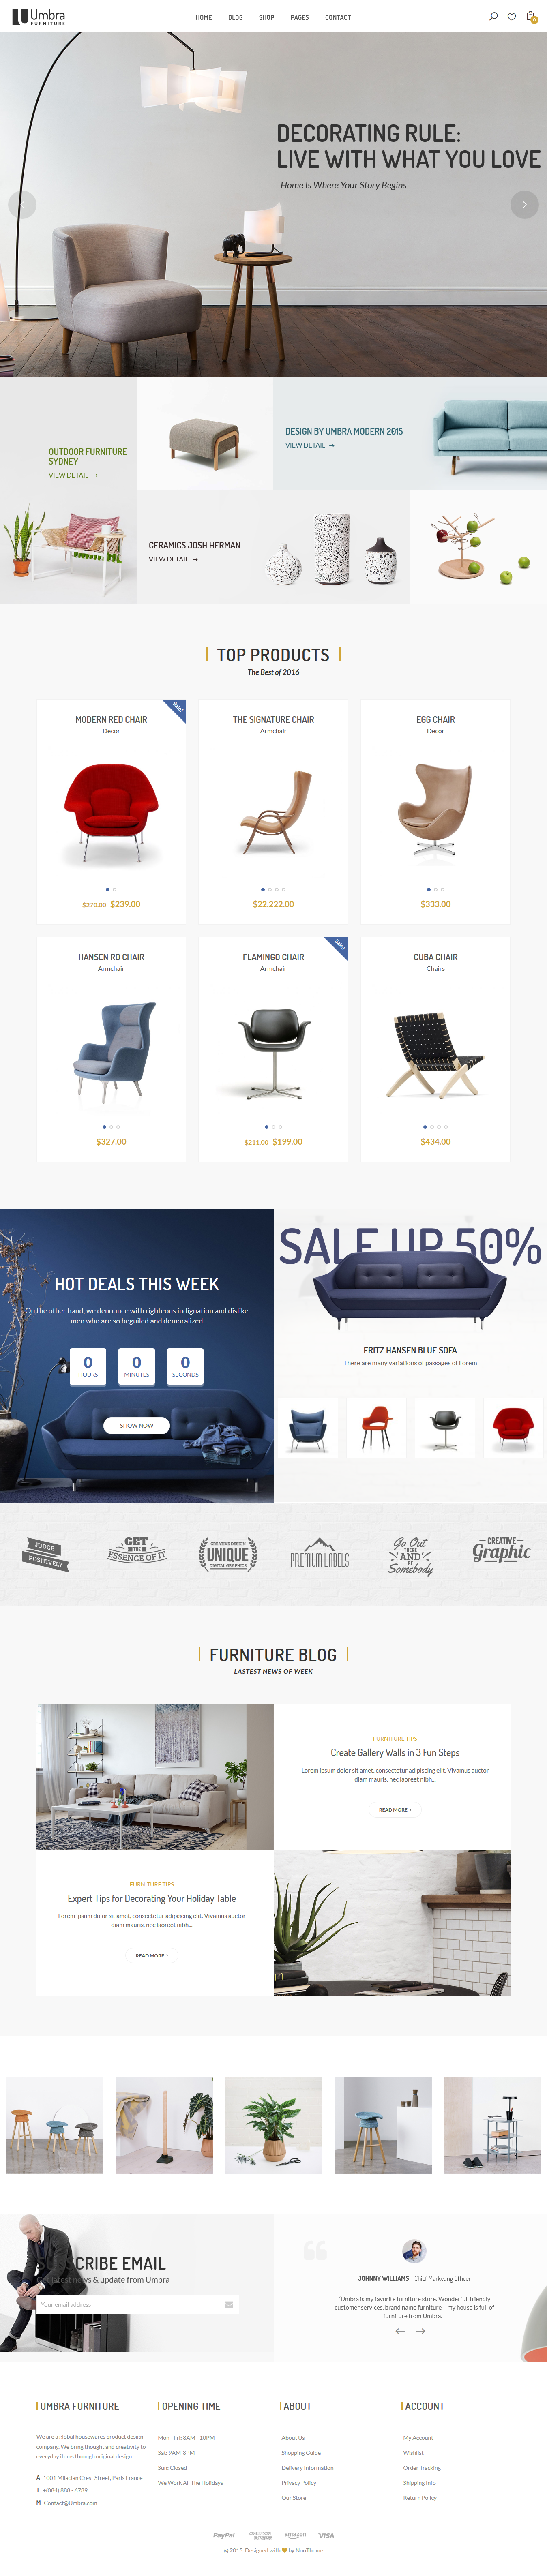 Pin by best Graphic Design on WordPress eCommerce Themes | Wordpress